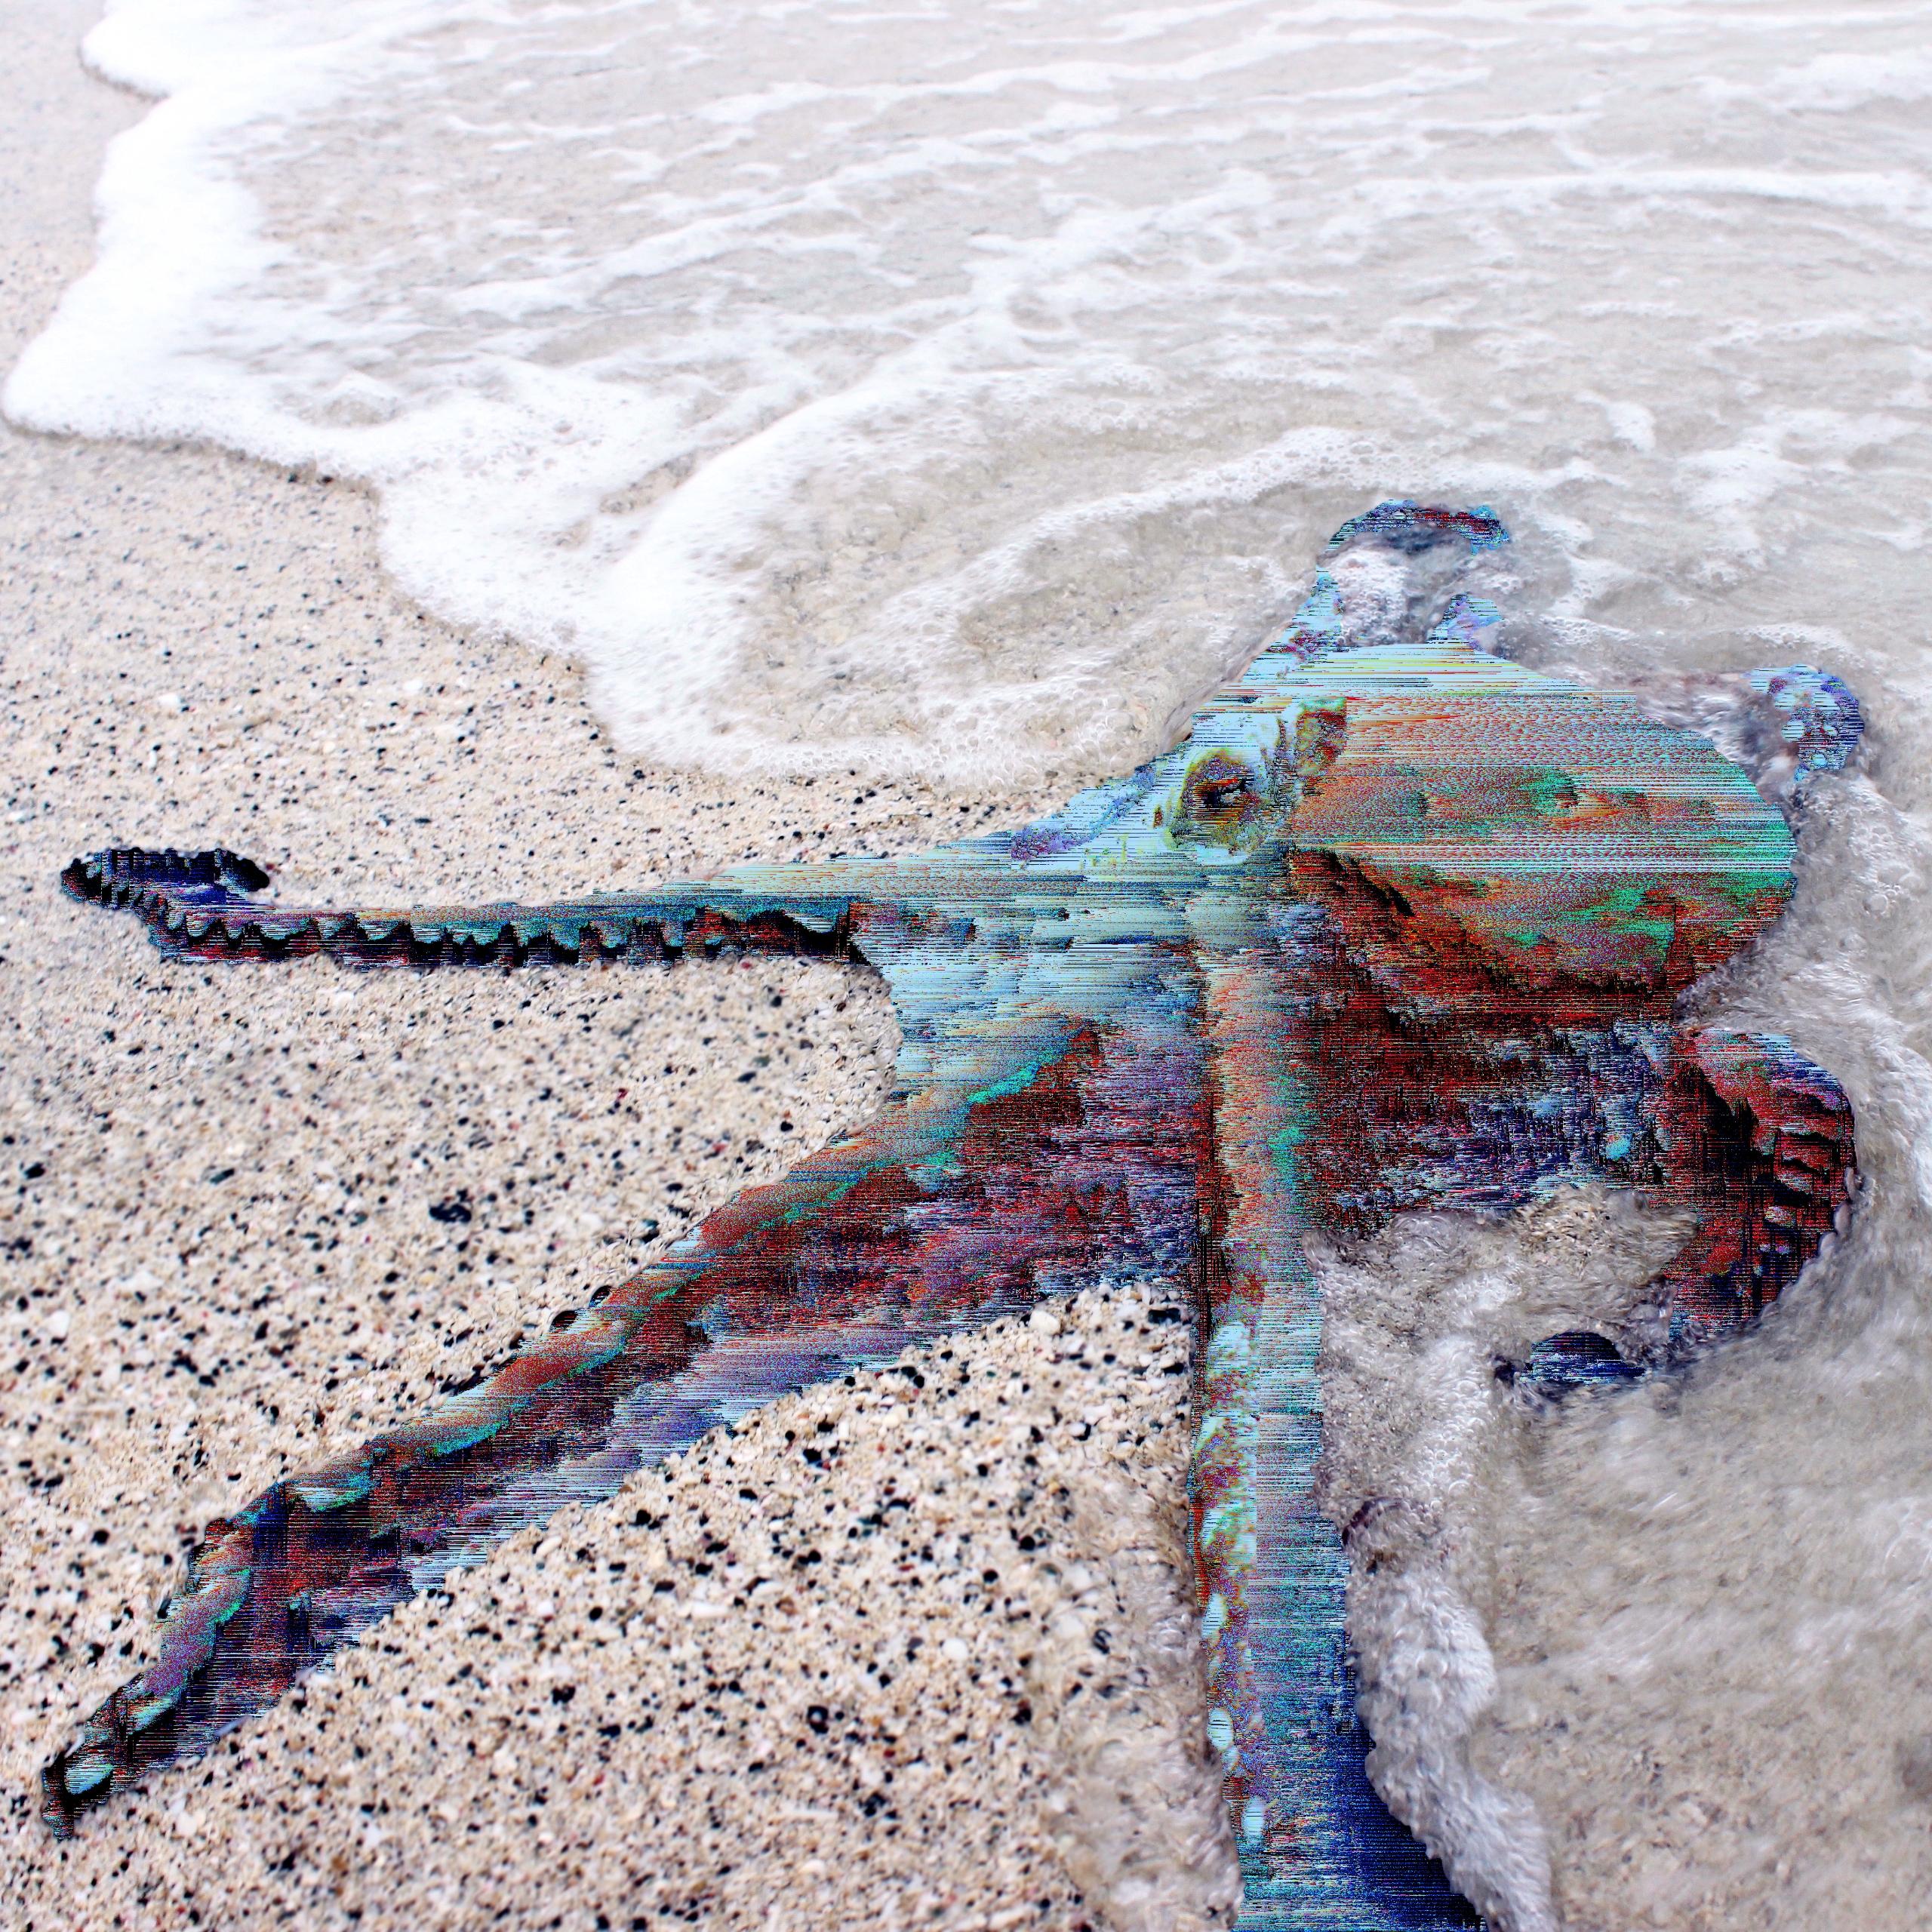 271/365 | - Octopus, Mollusca, Jlitch365 - jrdsctt | ello